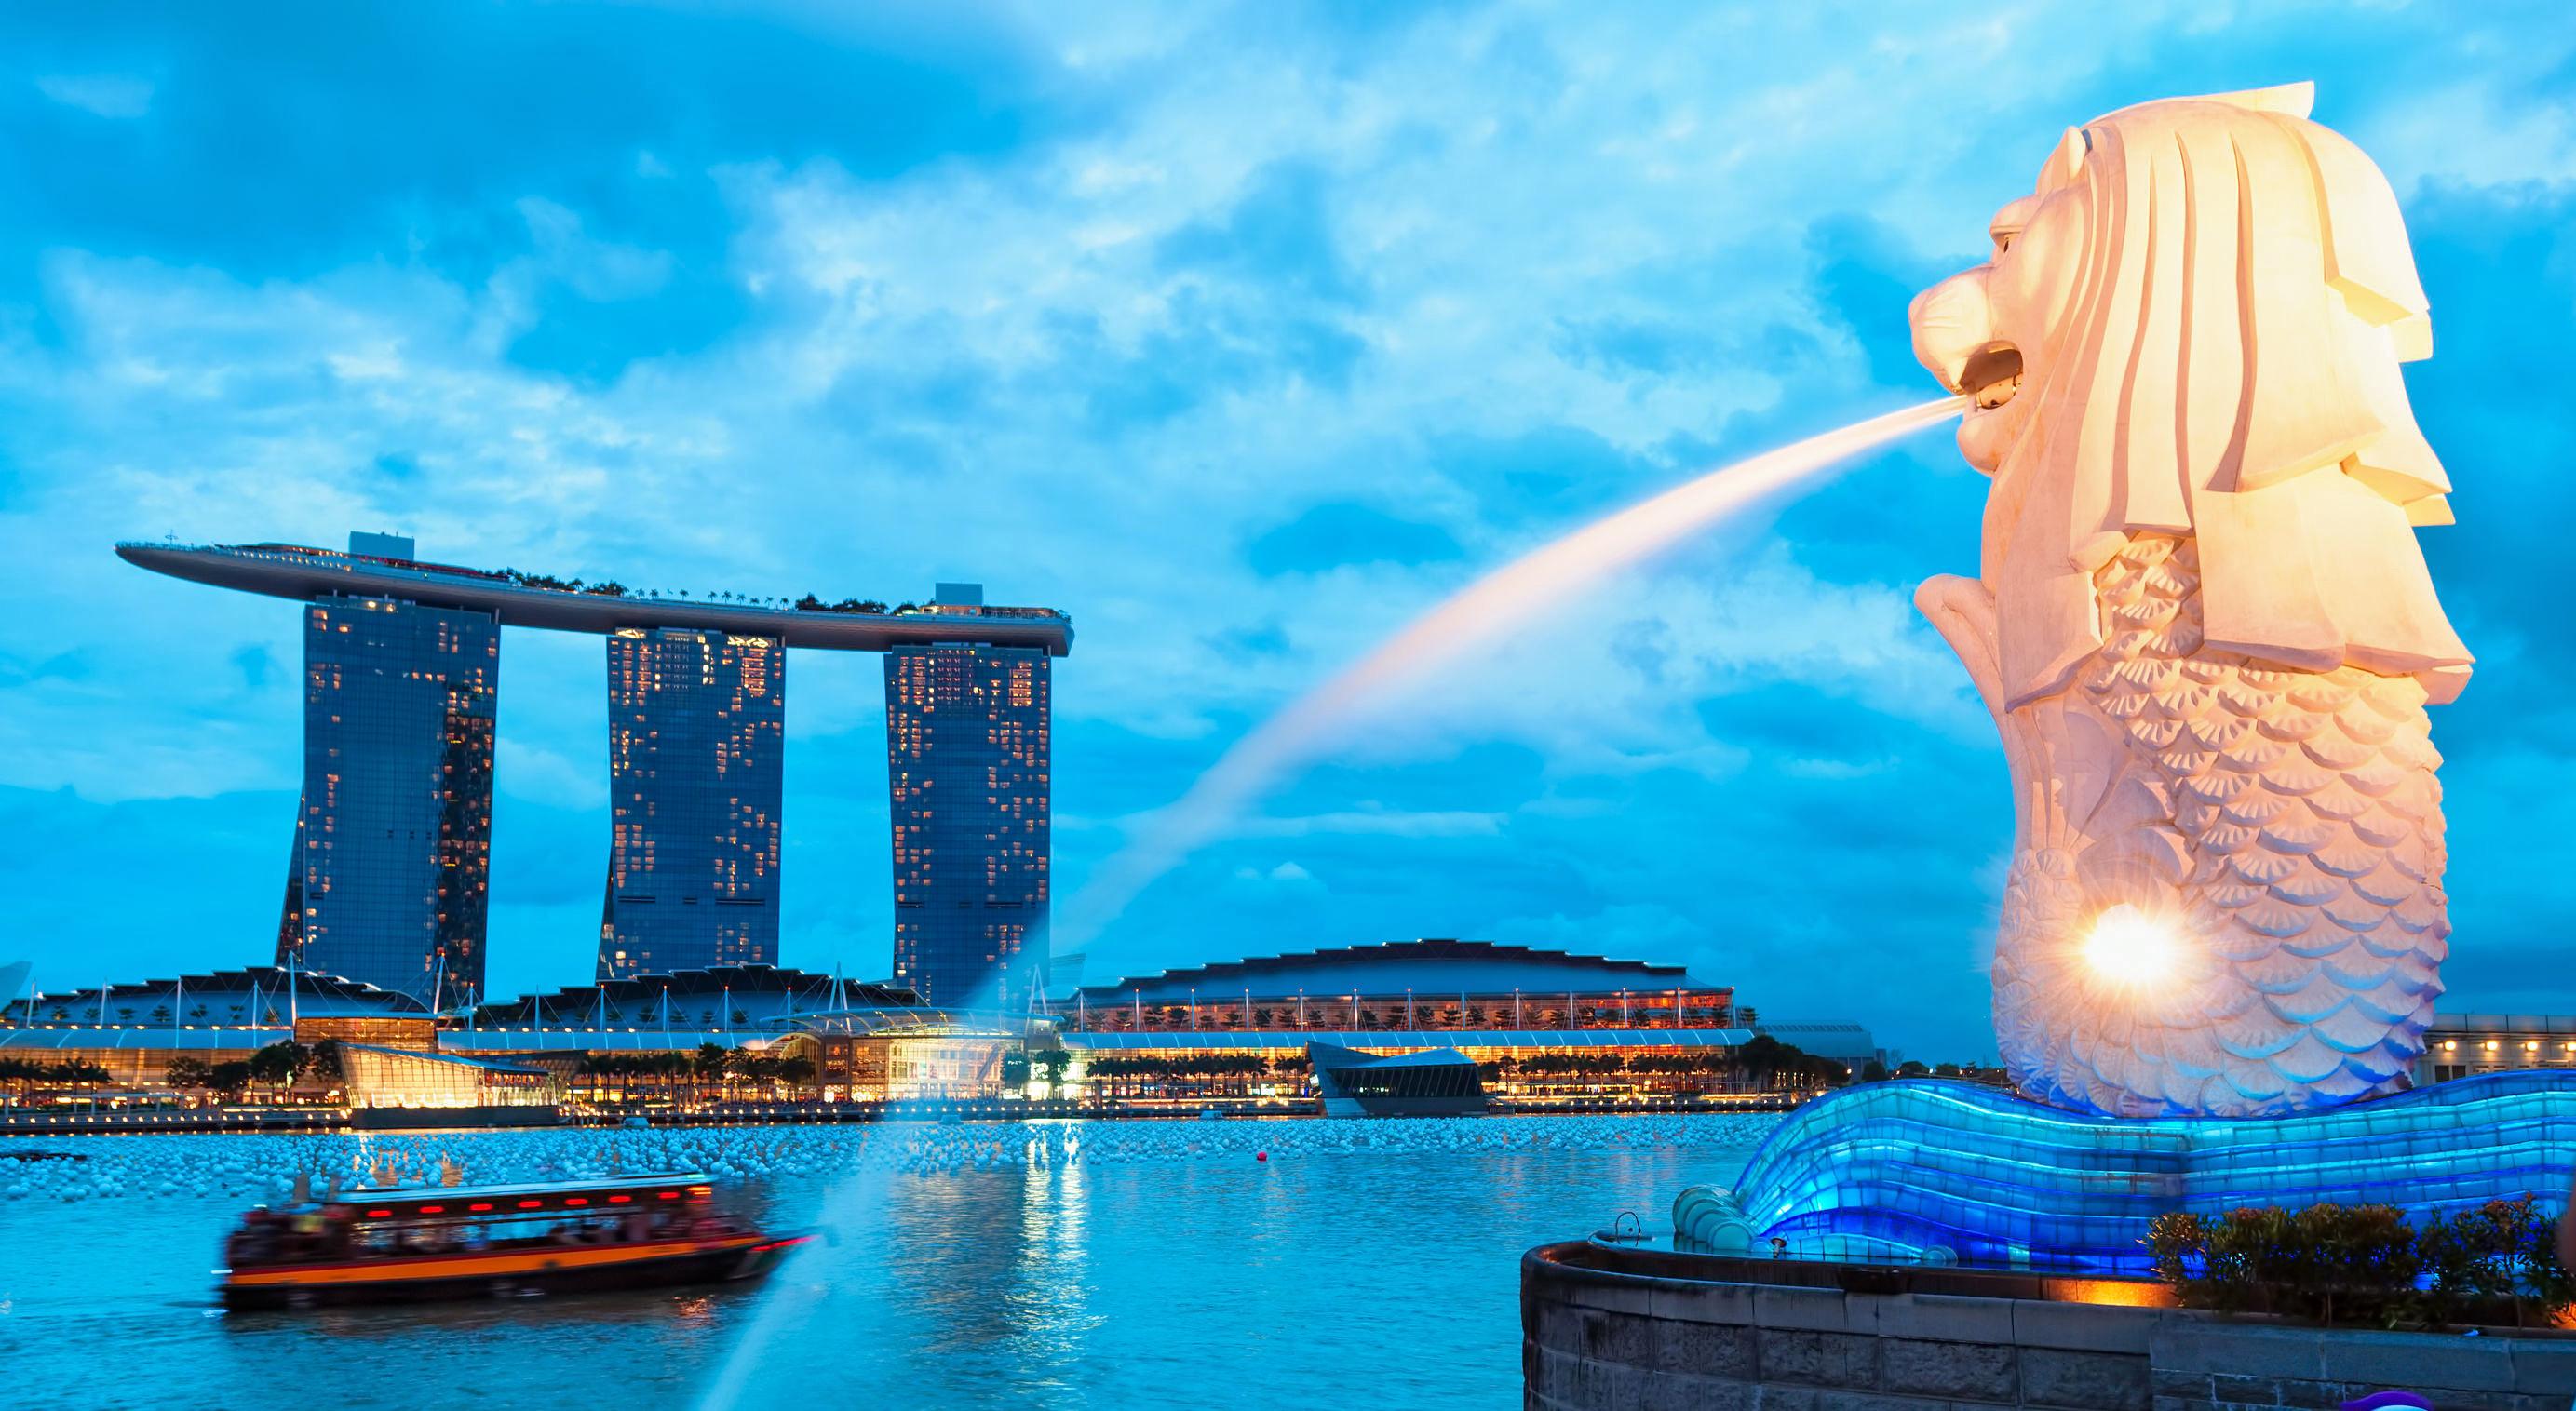 1519642081_singapore-merlion.jpg